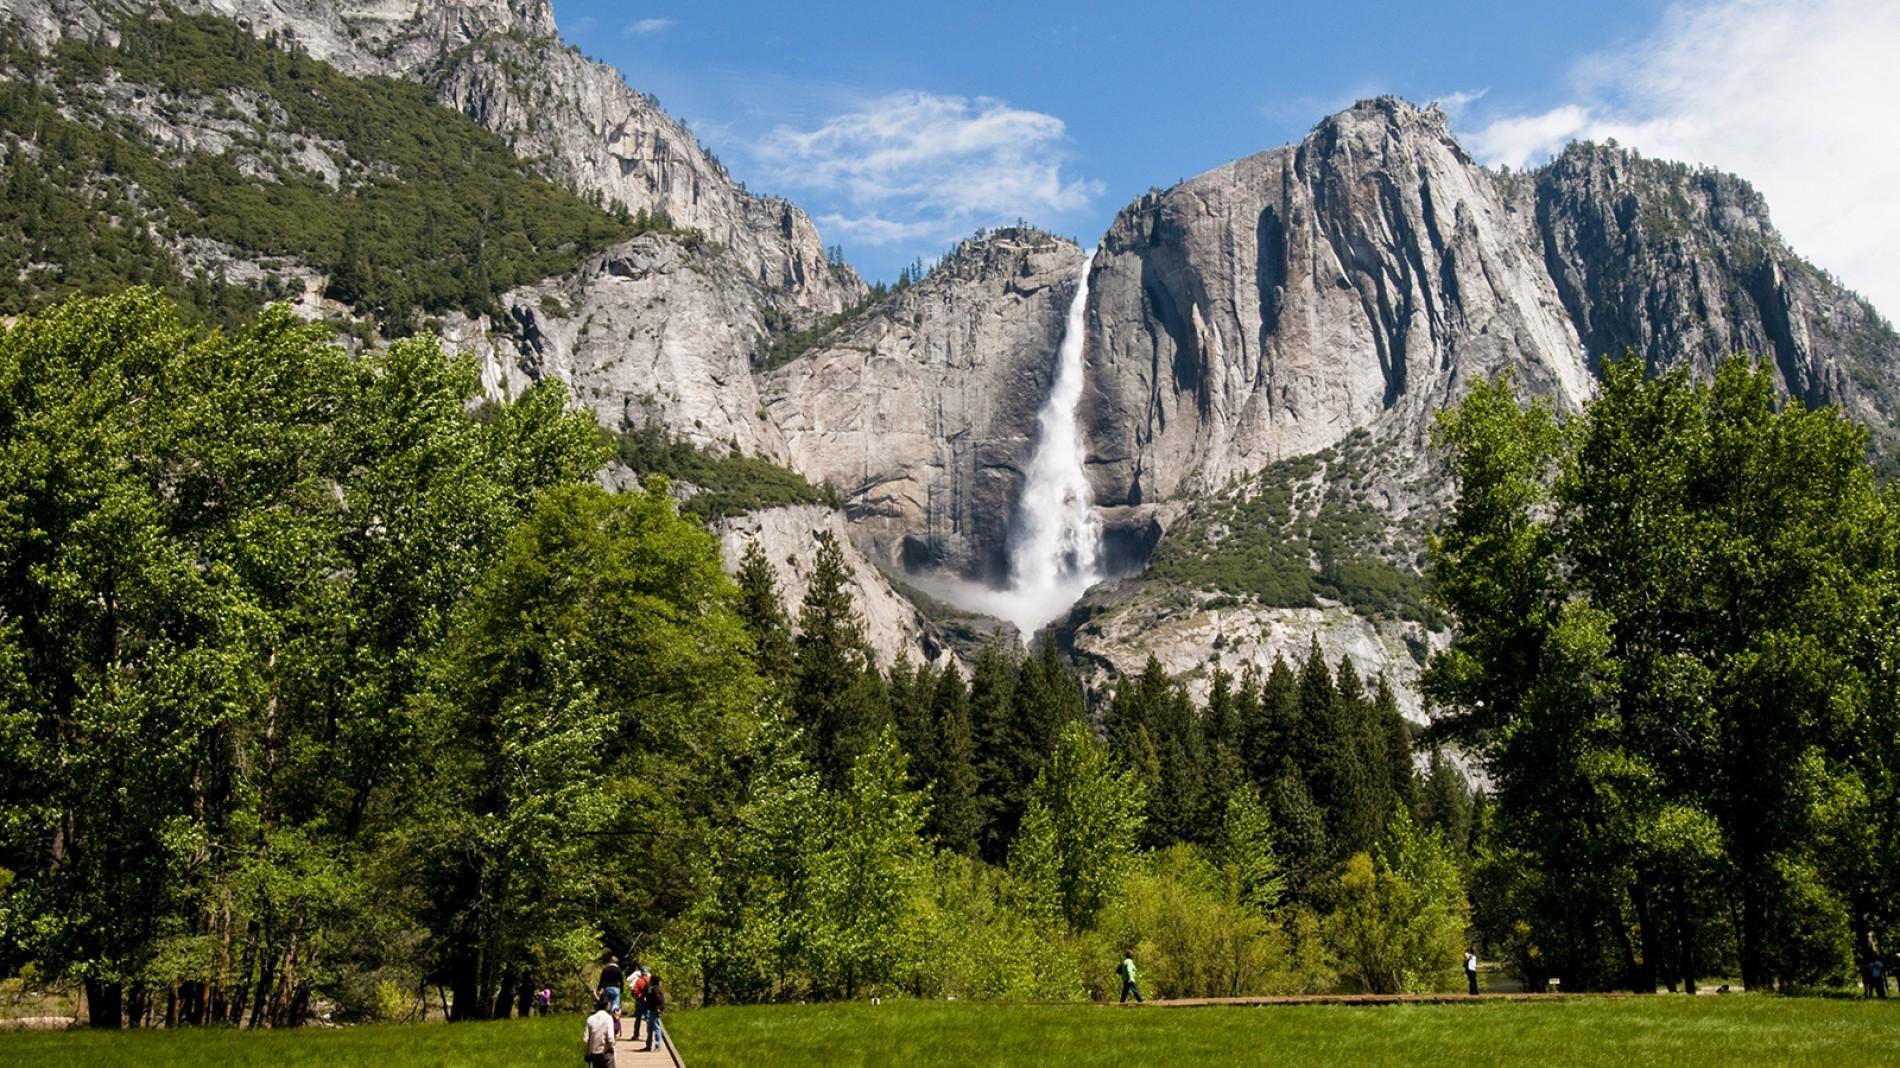 Yosemitewaterfall.ngsversion.1461149931536.adapt.1900.1.jpg